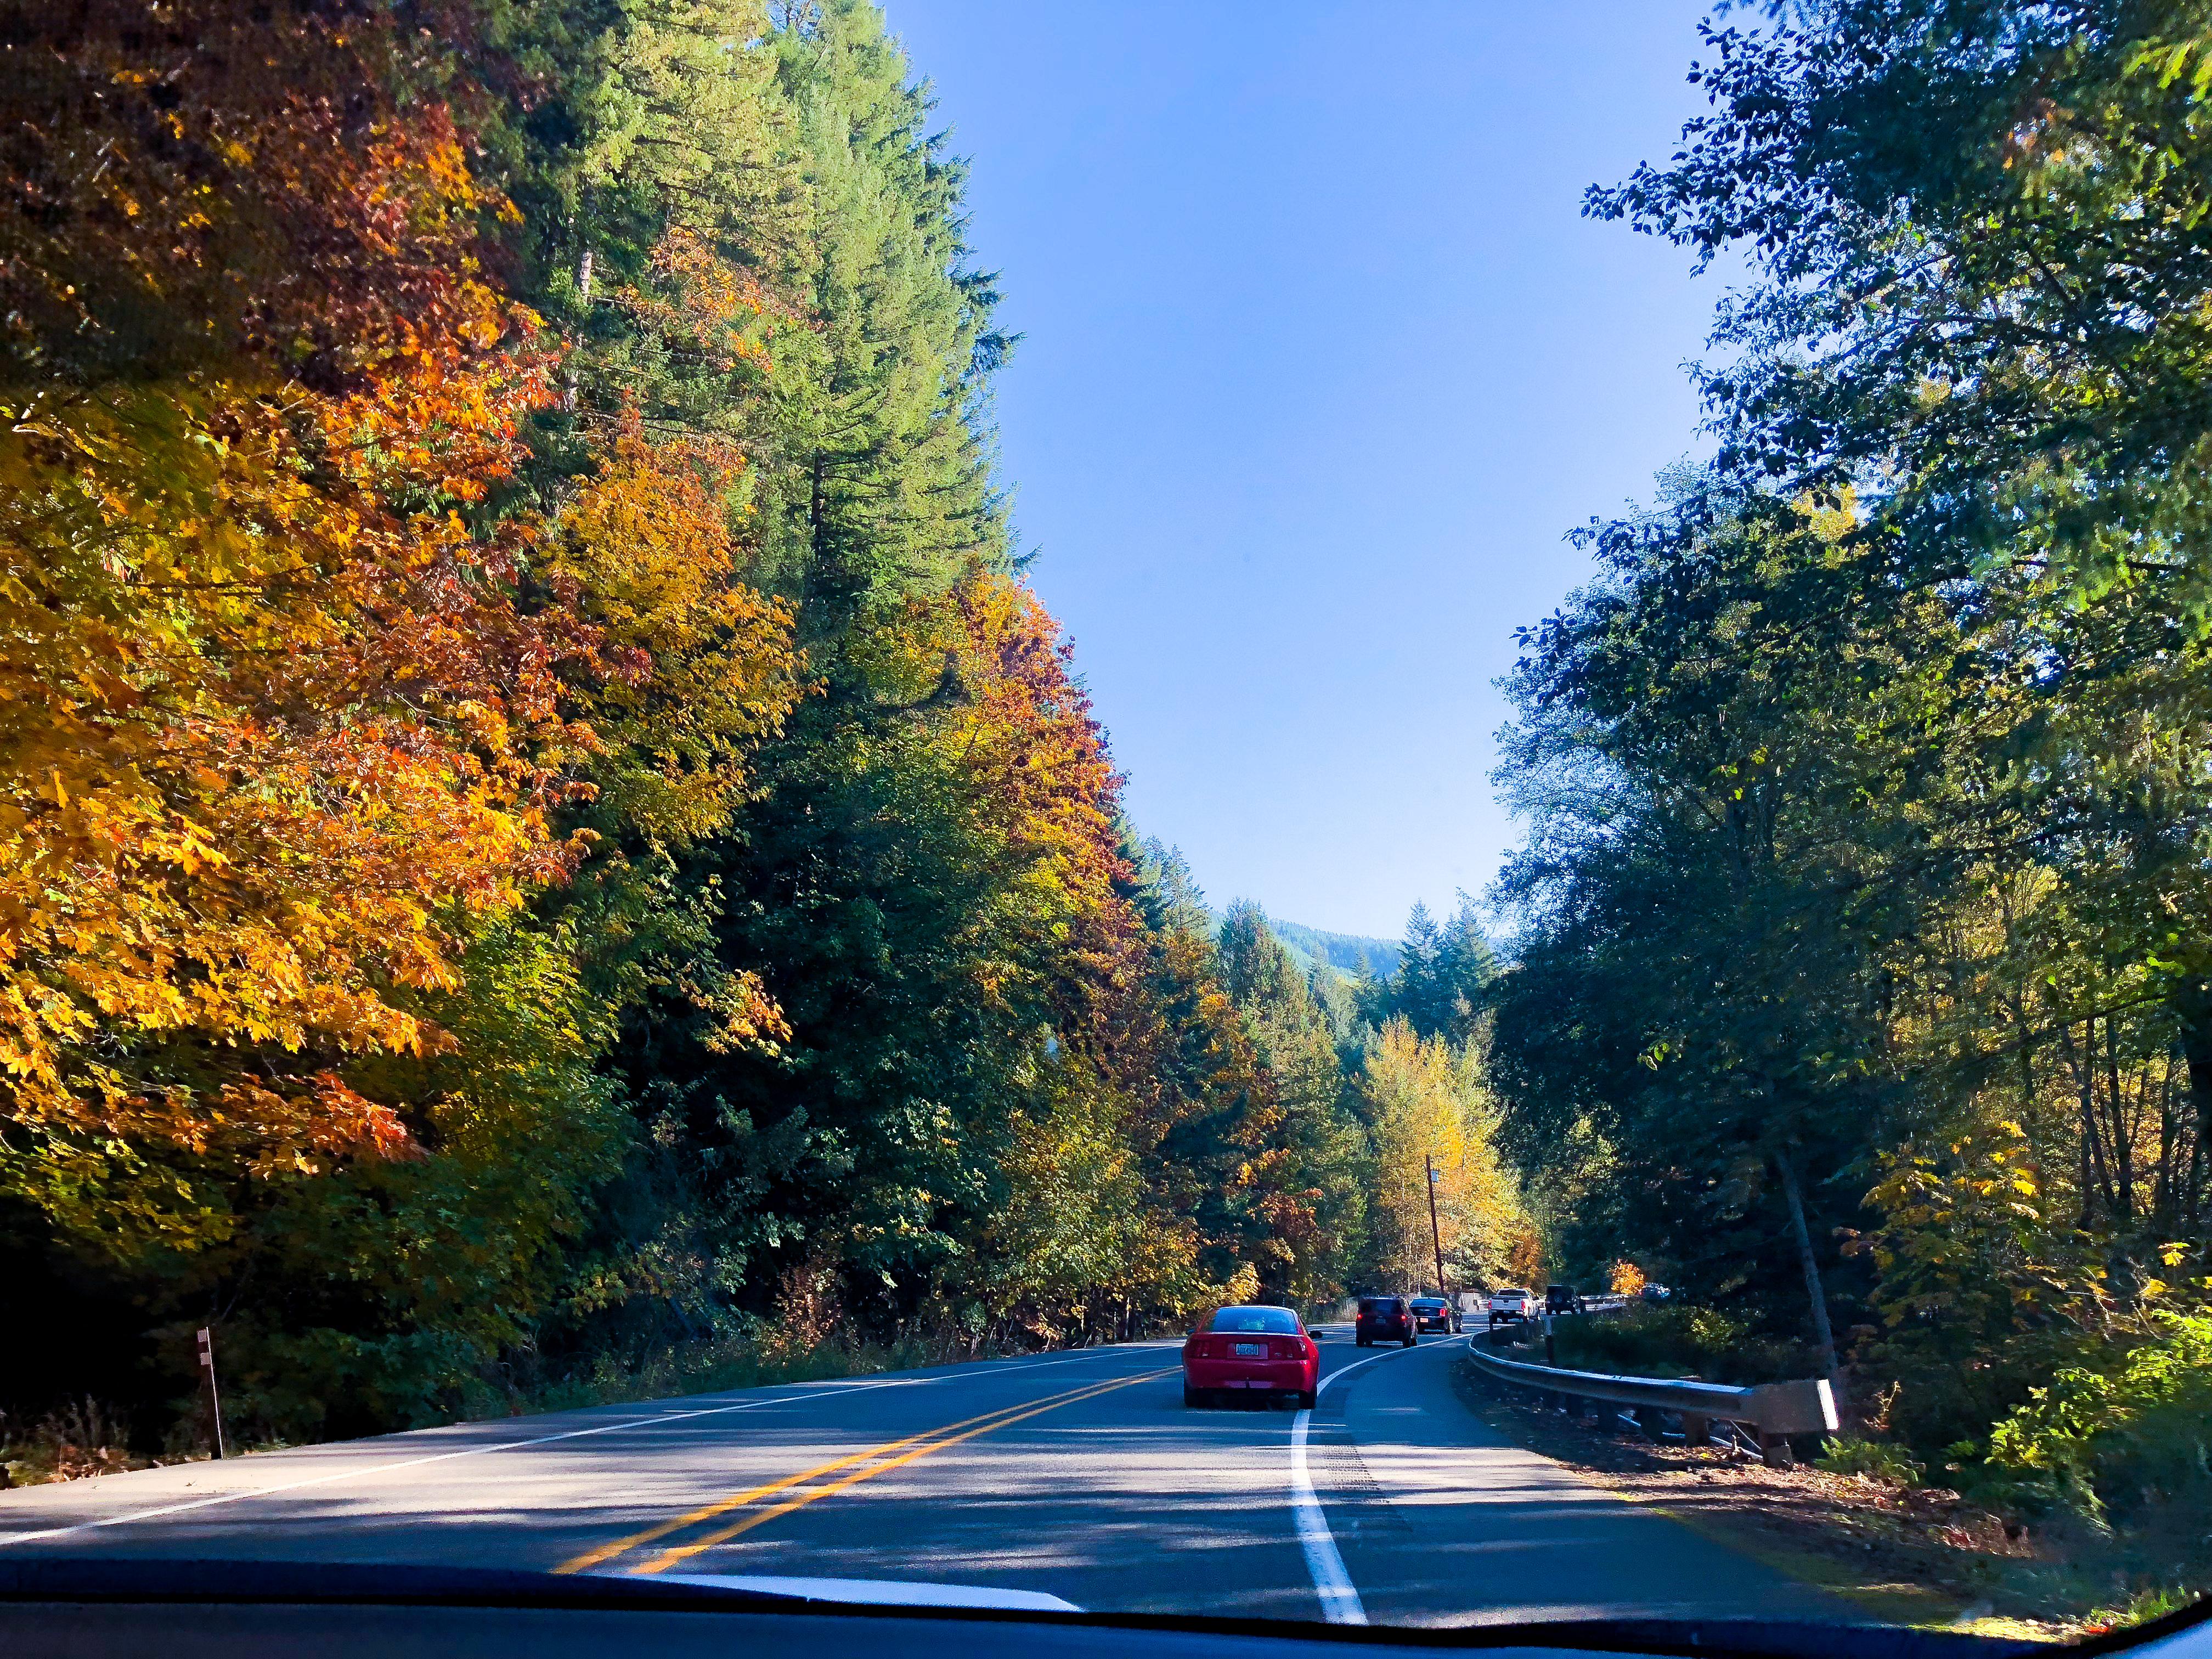 The drive to Mt. Rainier in Washington